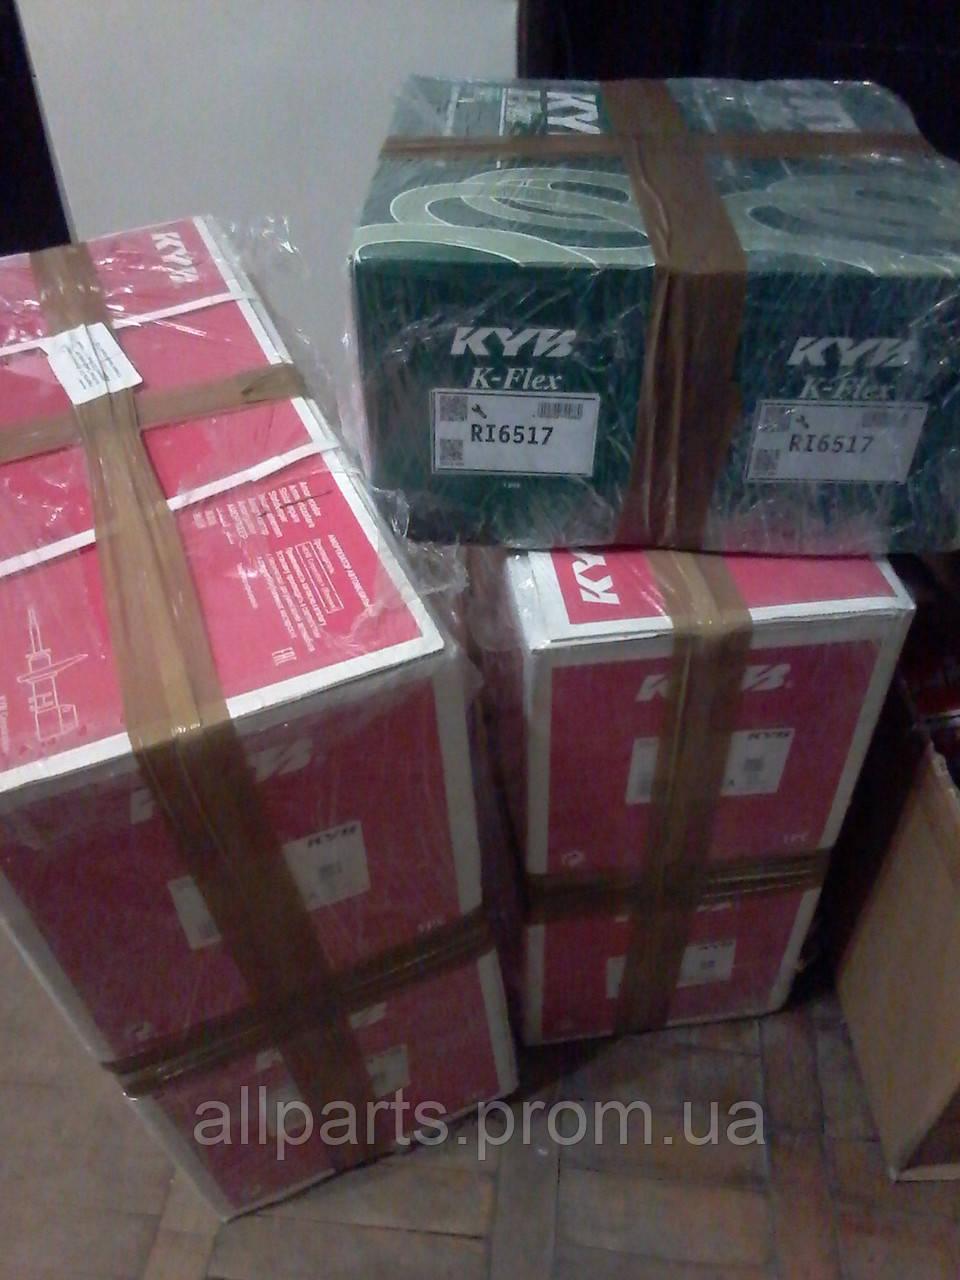 Амортизаторы на Лексус - Lexus RX-300, RX-350, GX470, LX470, LX570, GX460